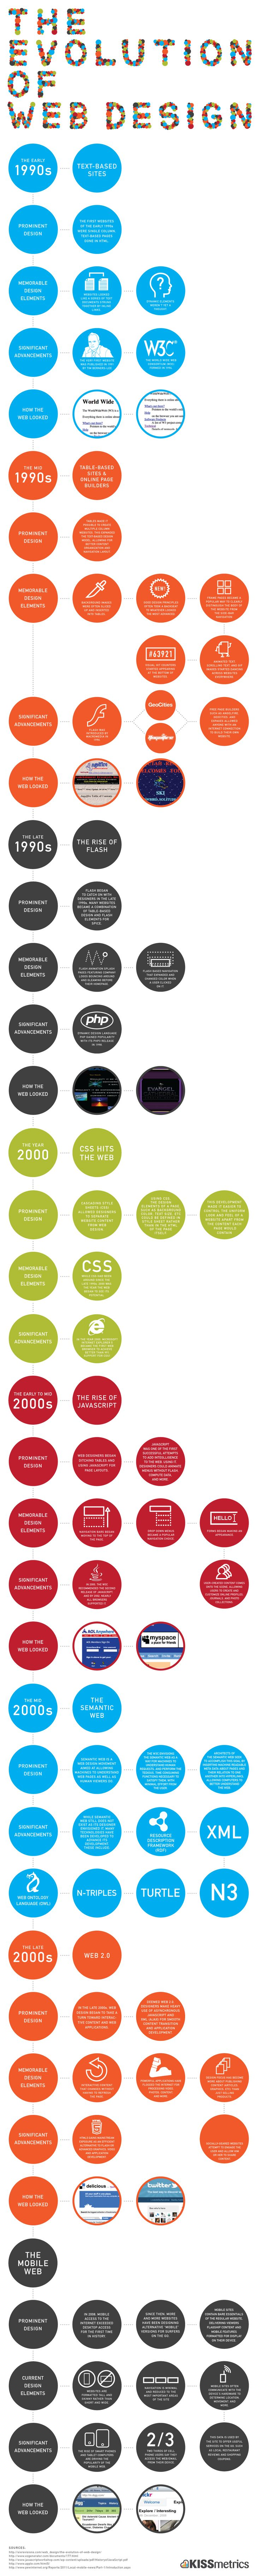 Evolution of web design #infography